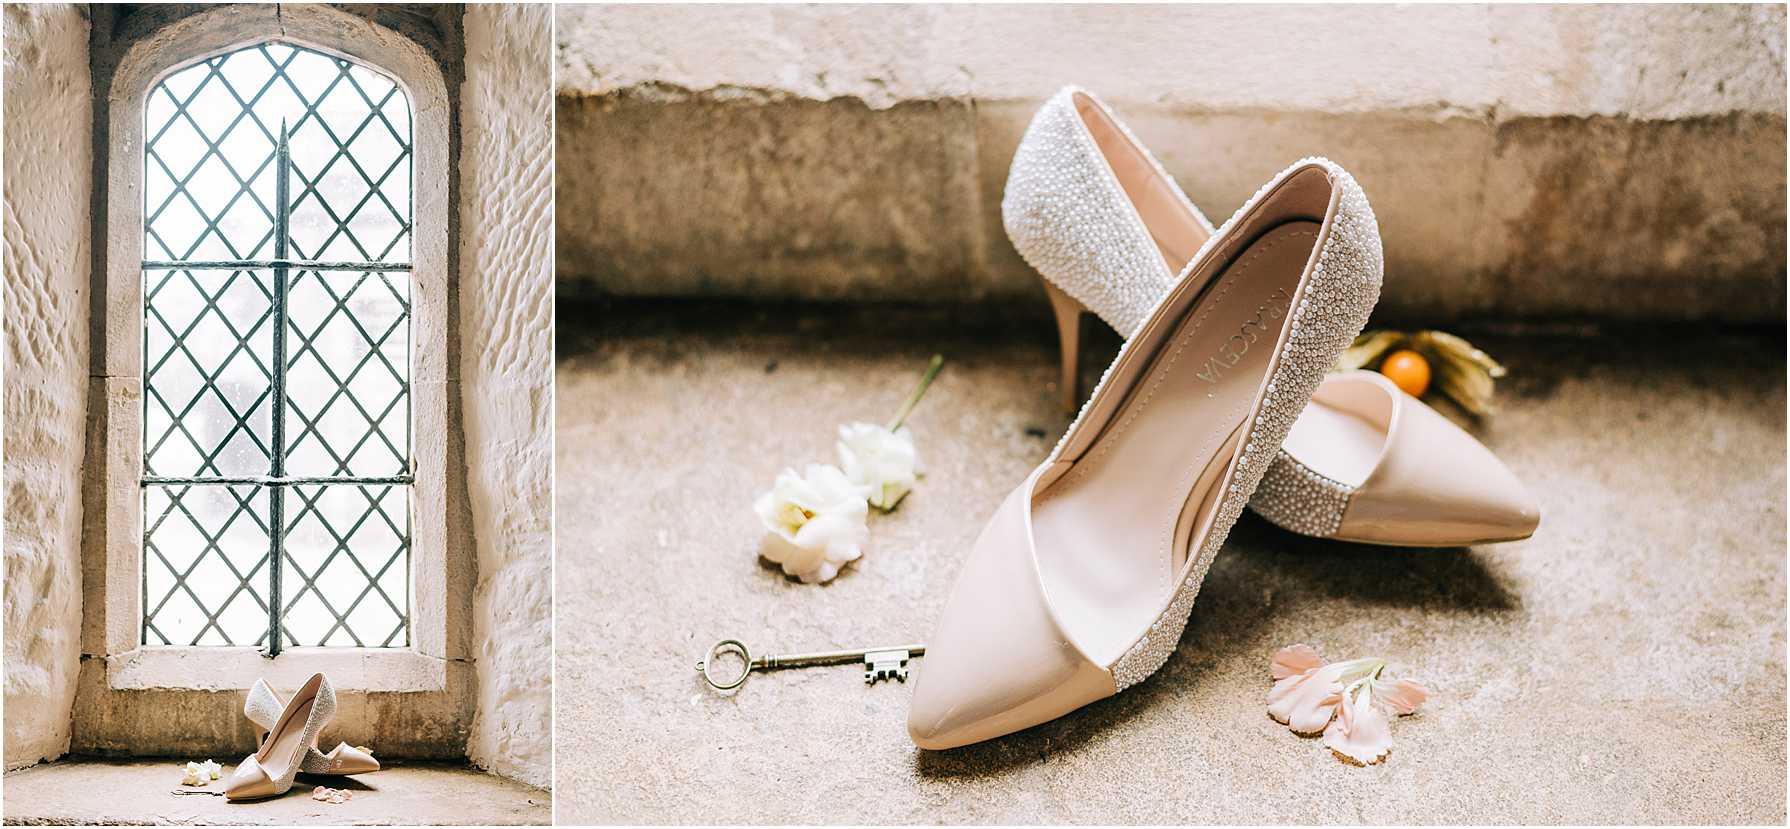 wedding shoes sitting in a brick window sill